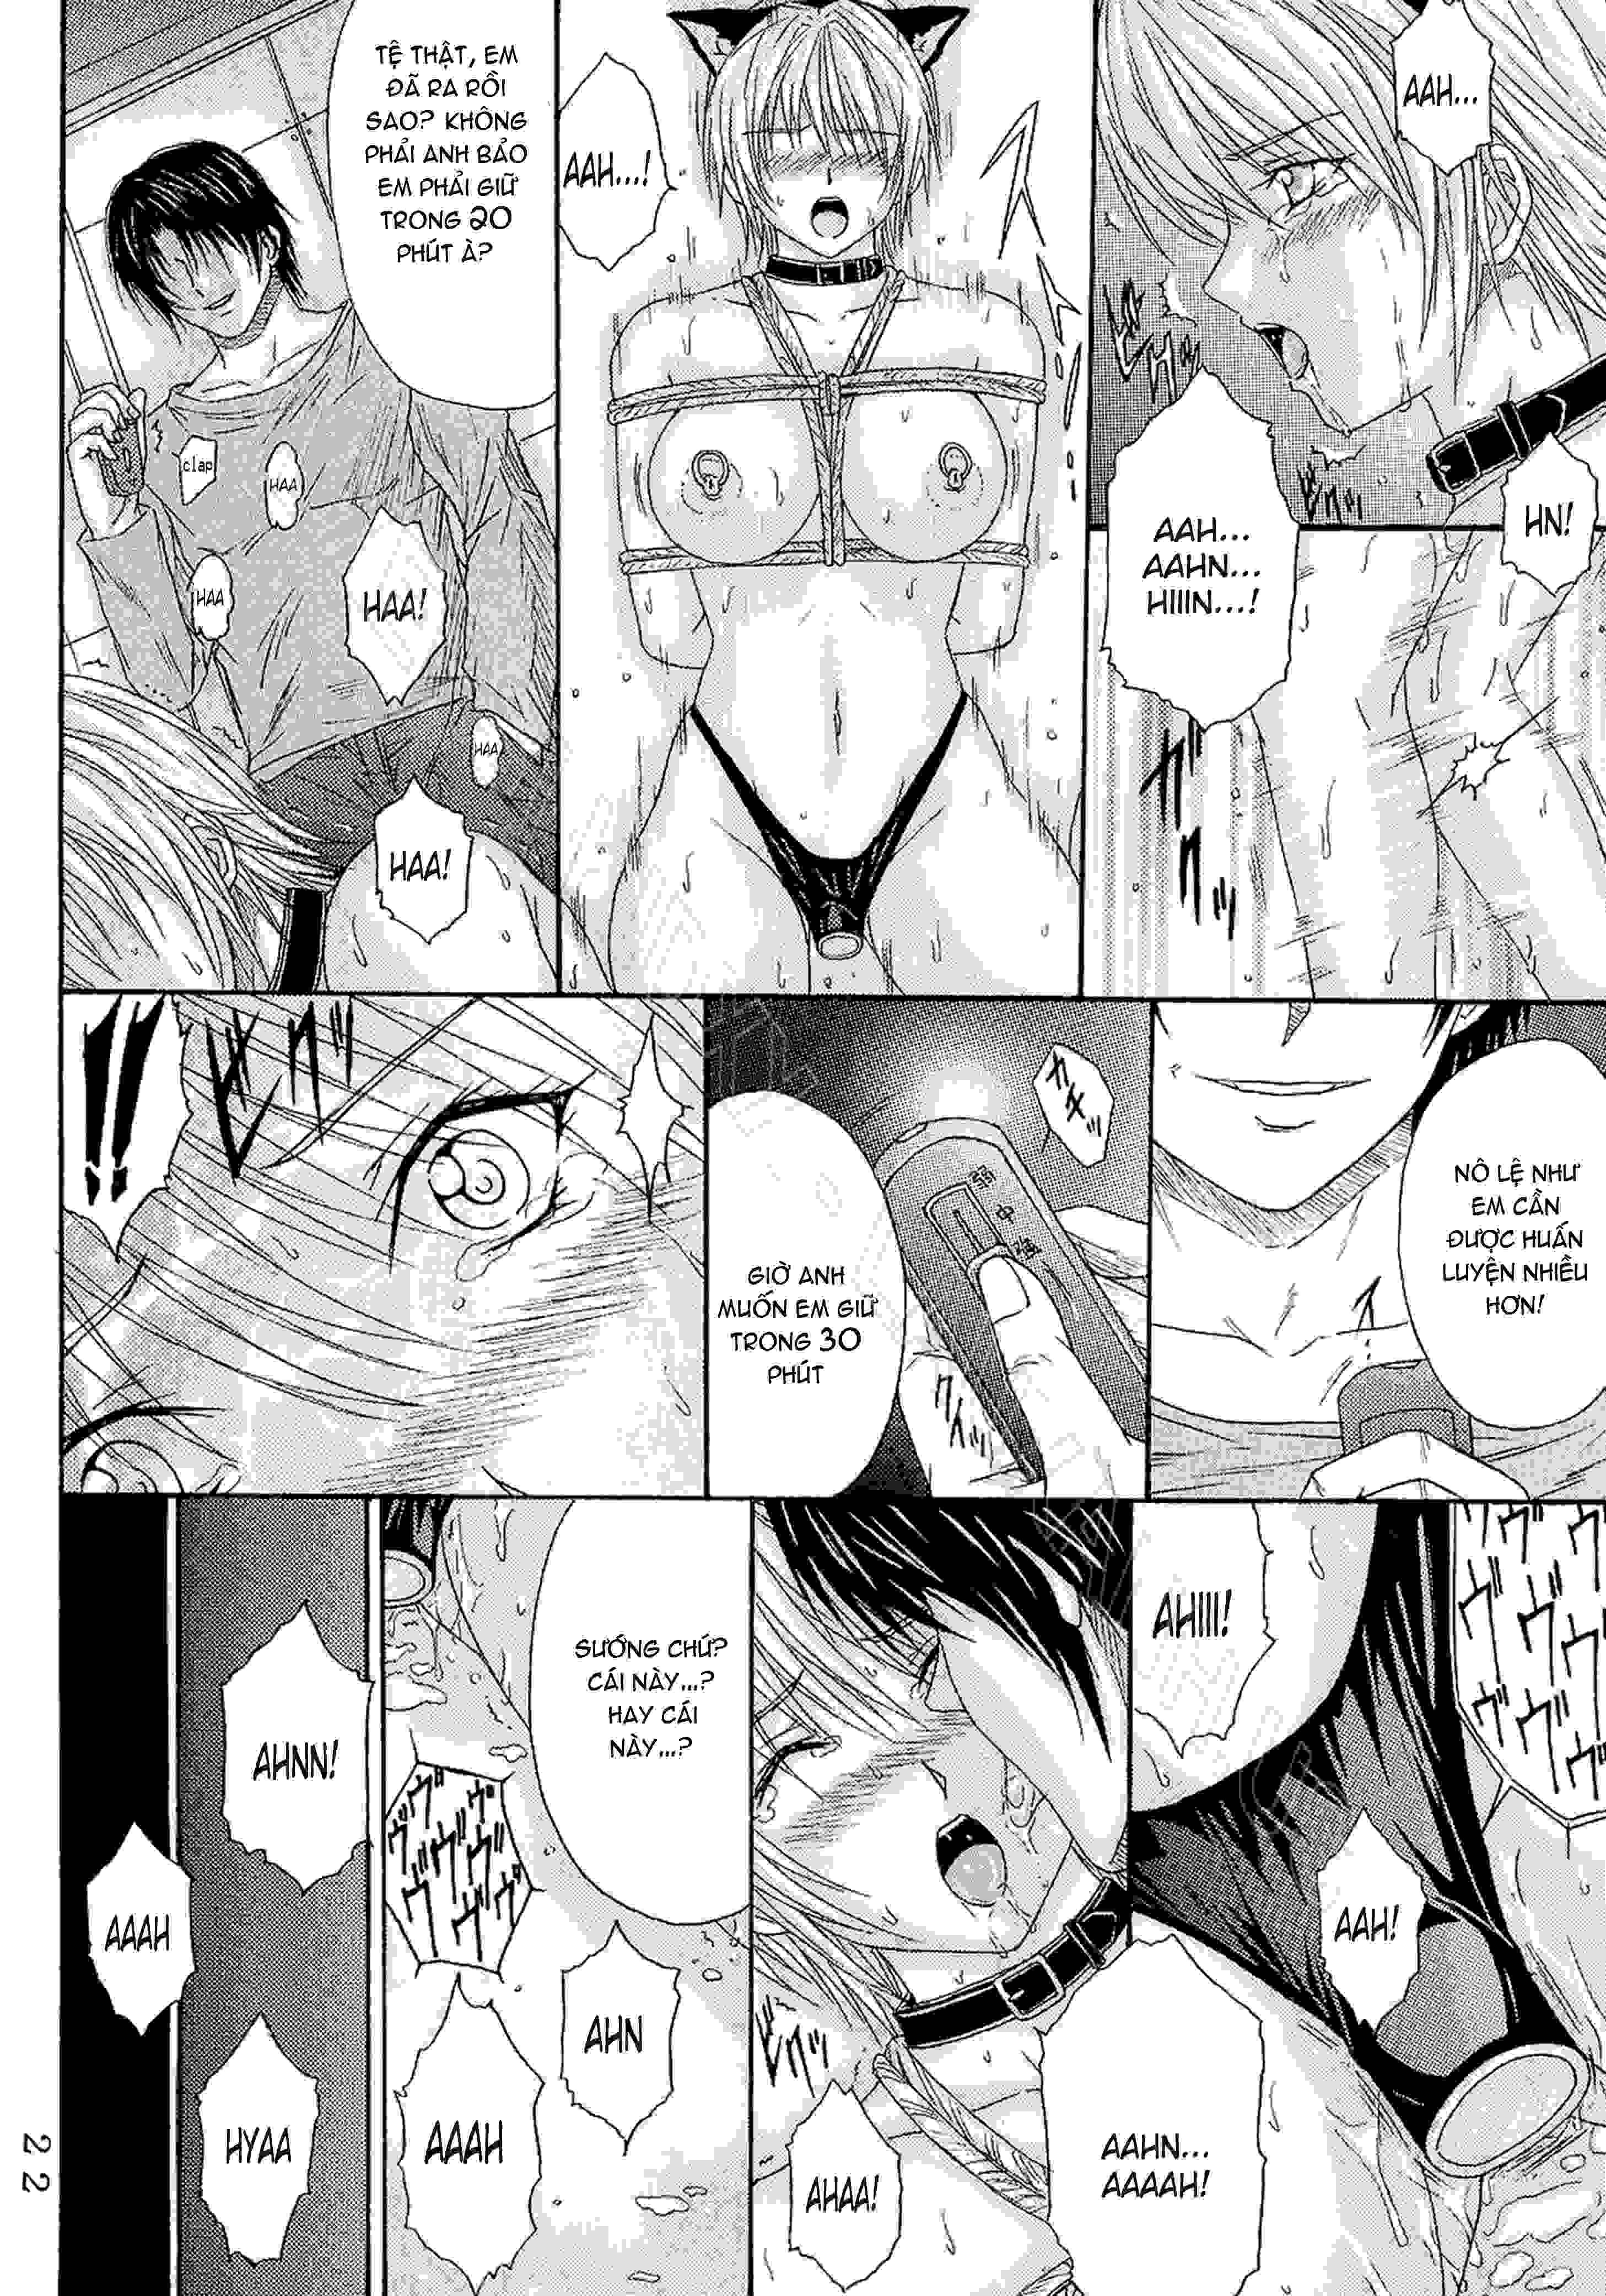 TruyenHay.Com - Ảnh 21 - Ryoujoku Rensa Chapter 6